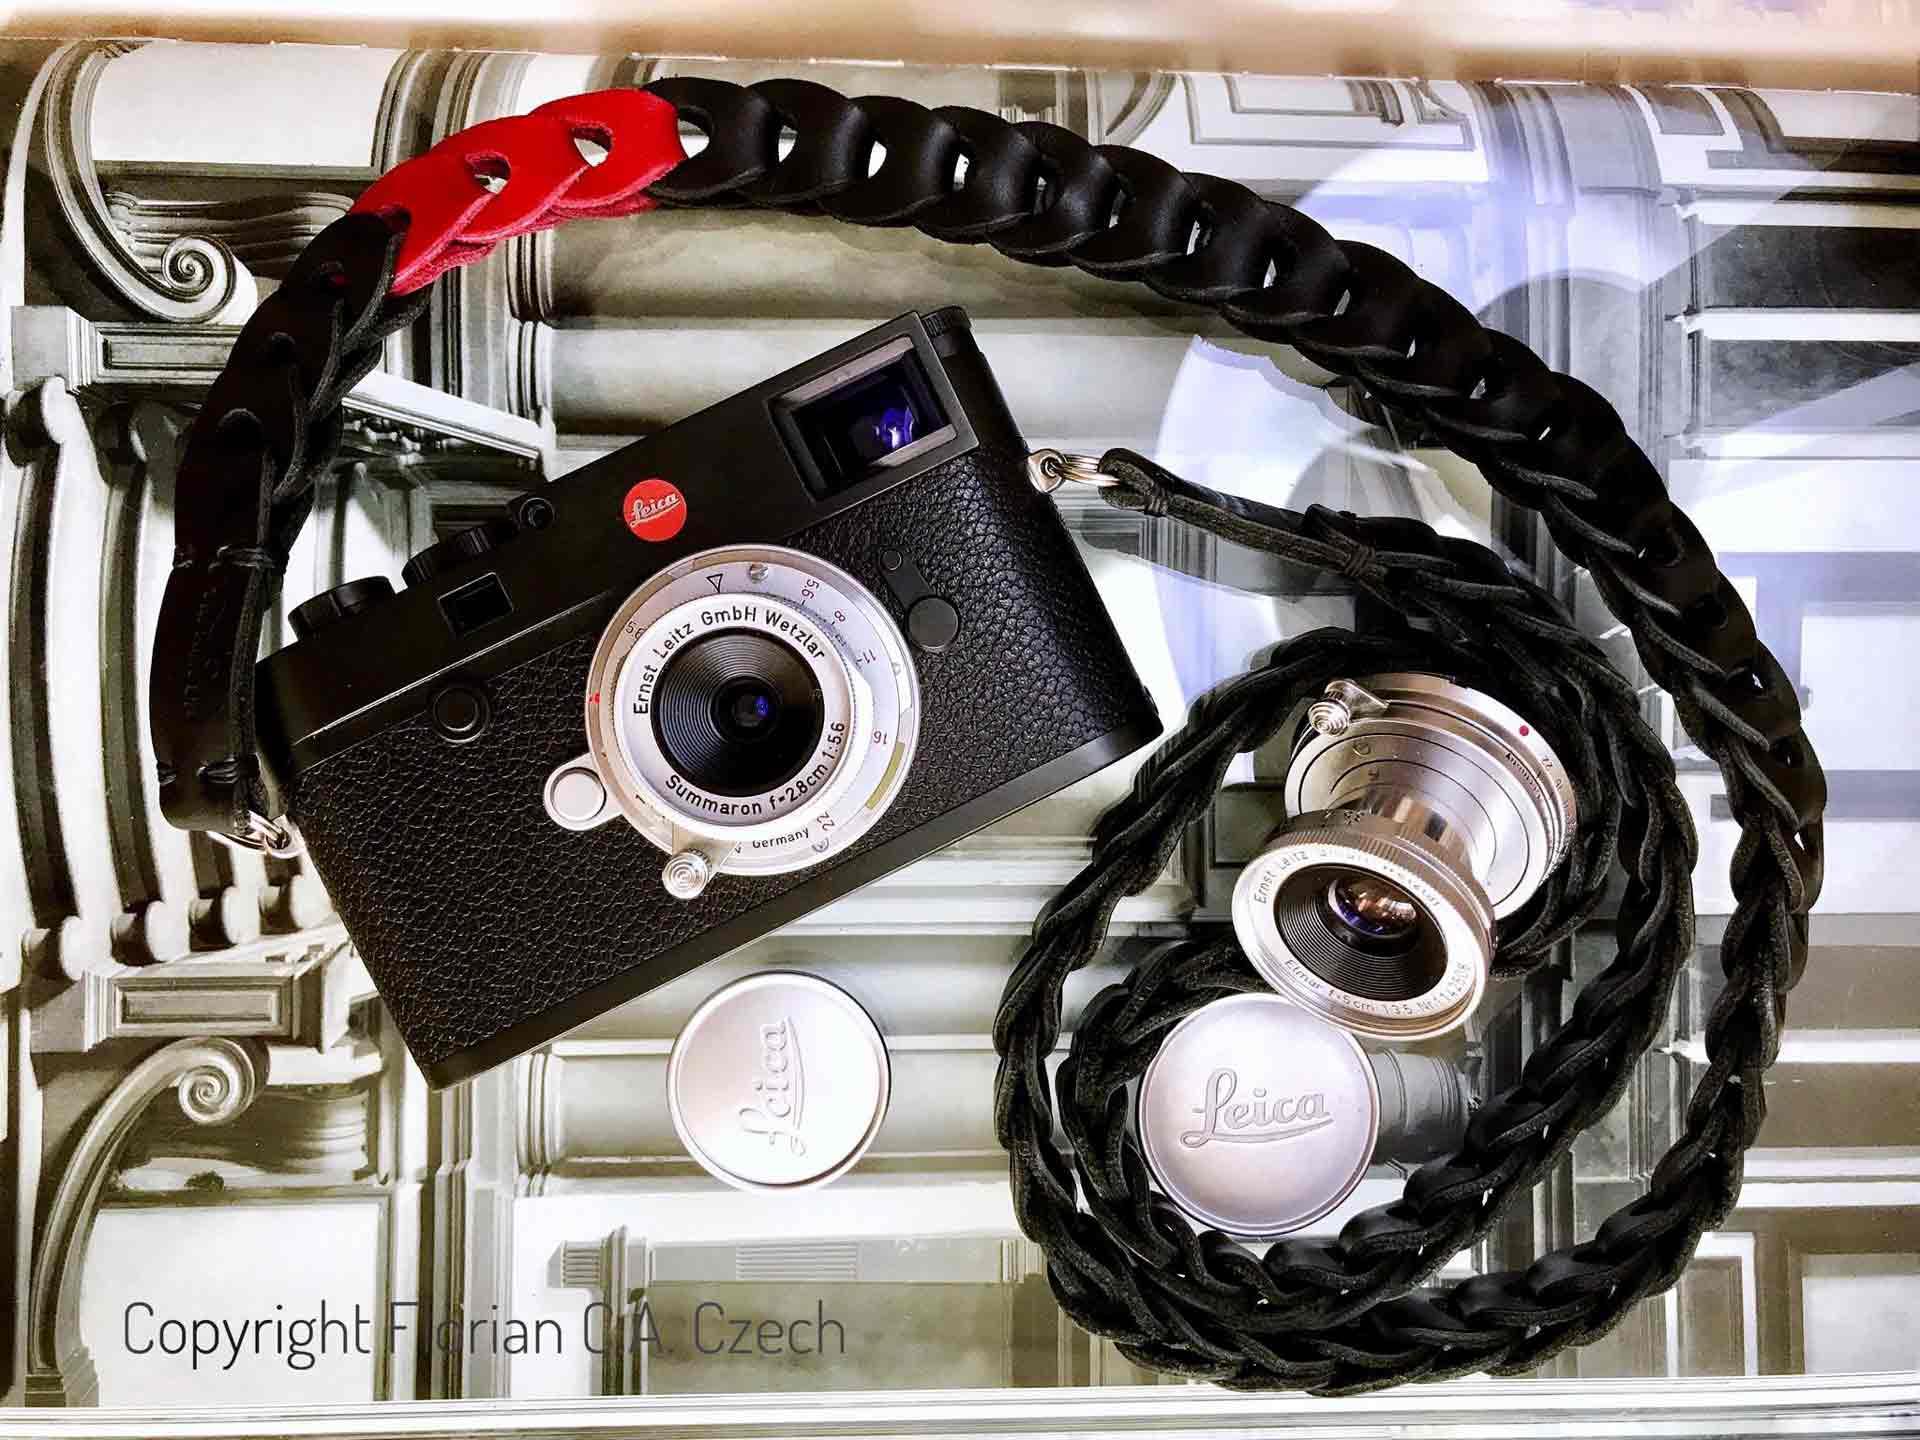 leica m strap, leather camera strap, handmade leather camera strap, vintage camera straps, leica camera strap, handmade camera strap, black camera strap, mirrorless camera strap